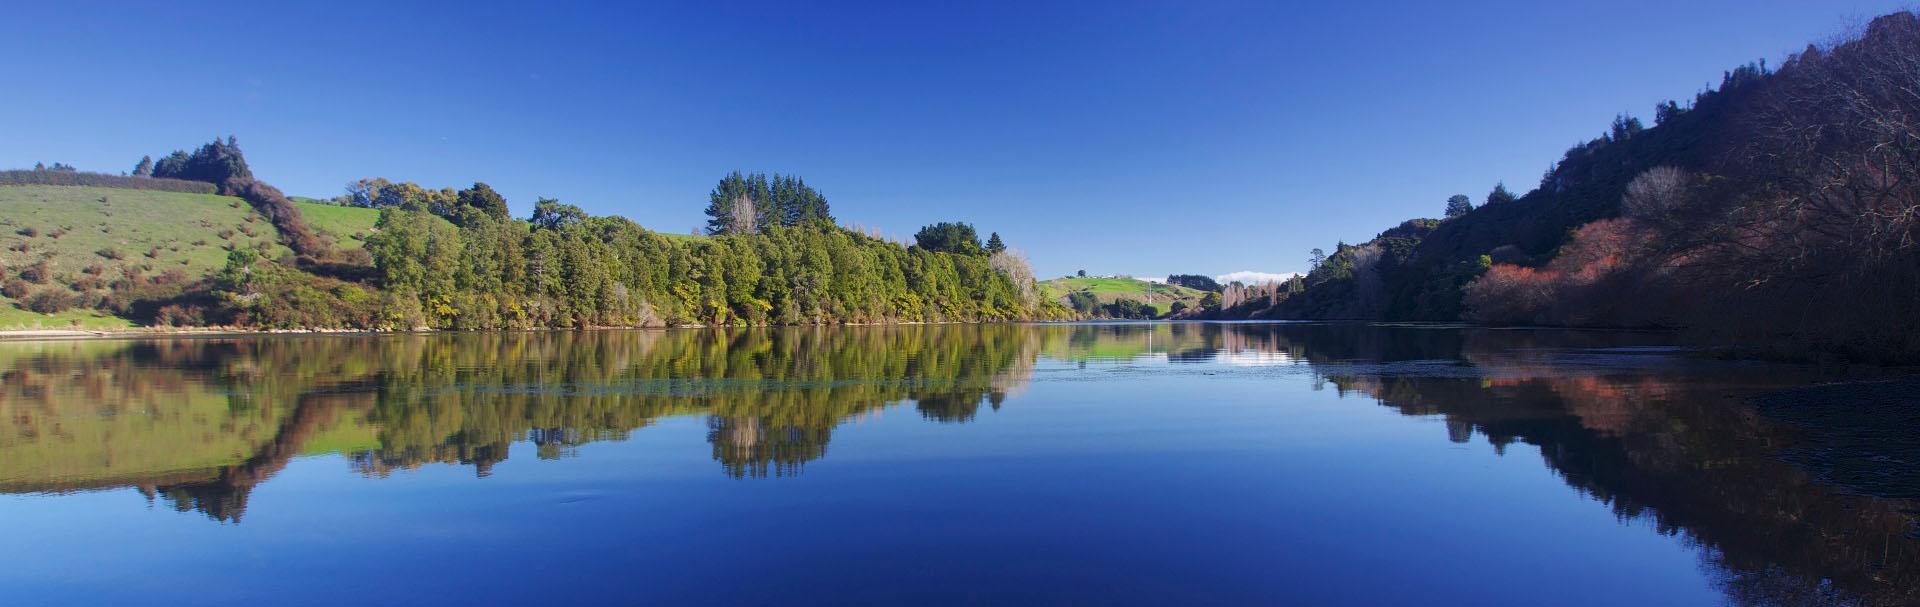 Waikato river landscape